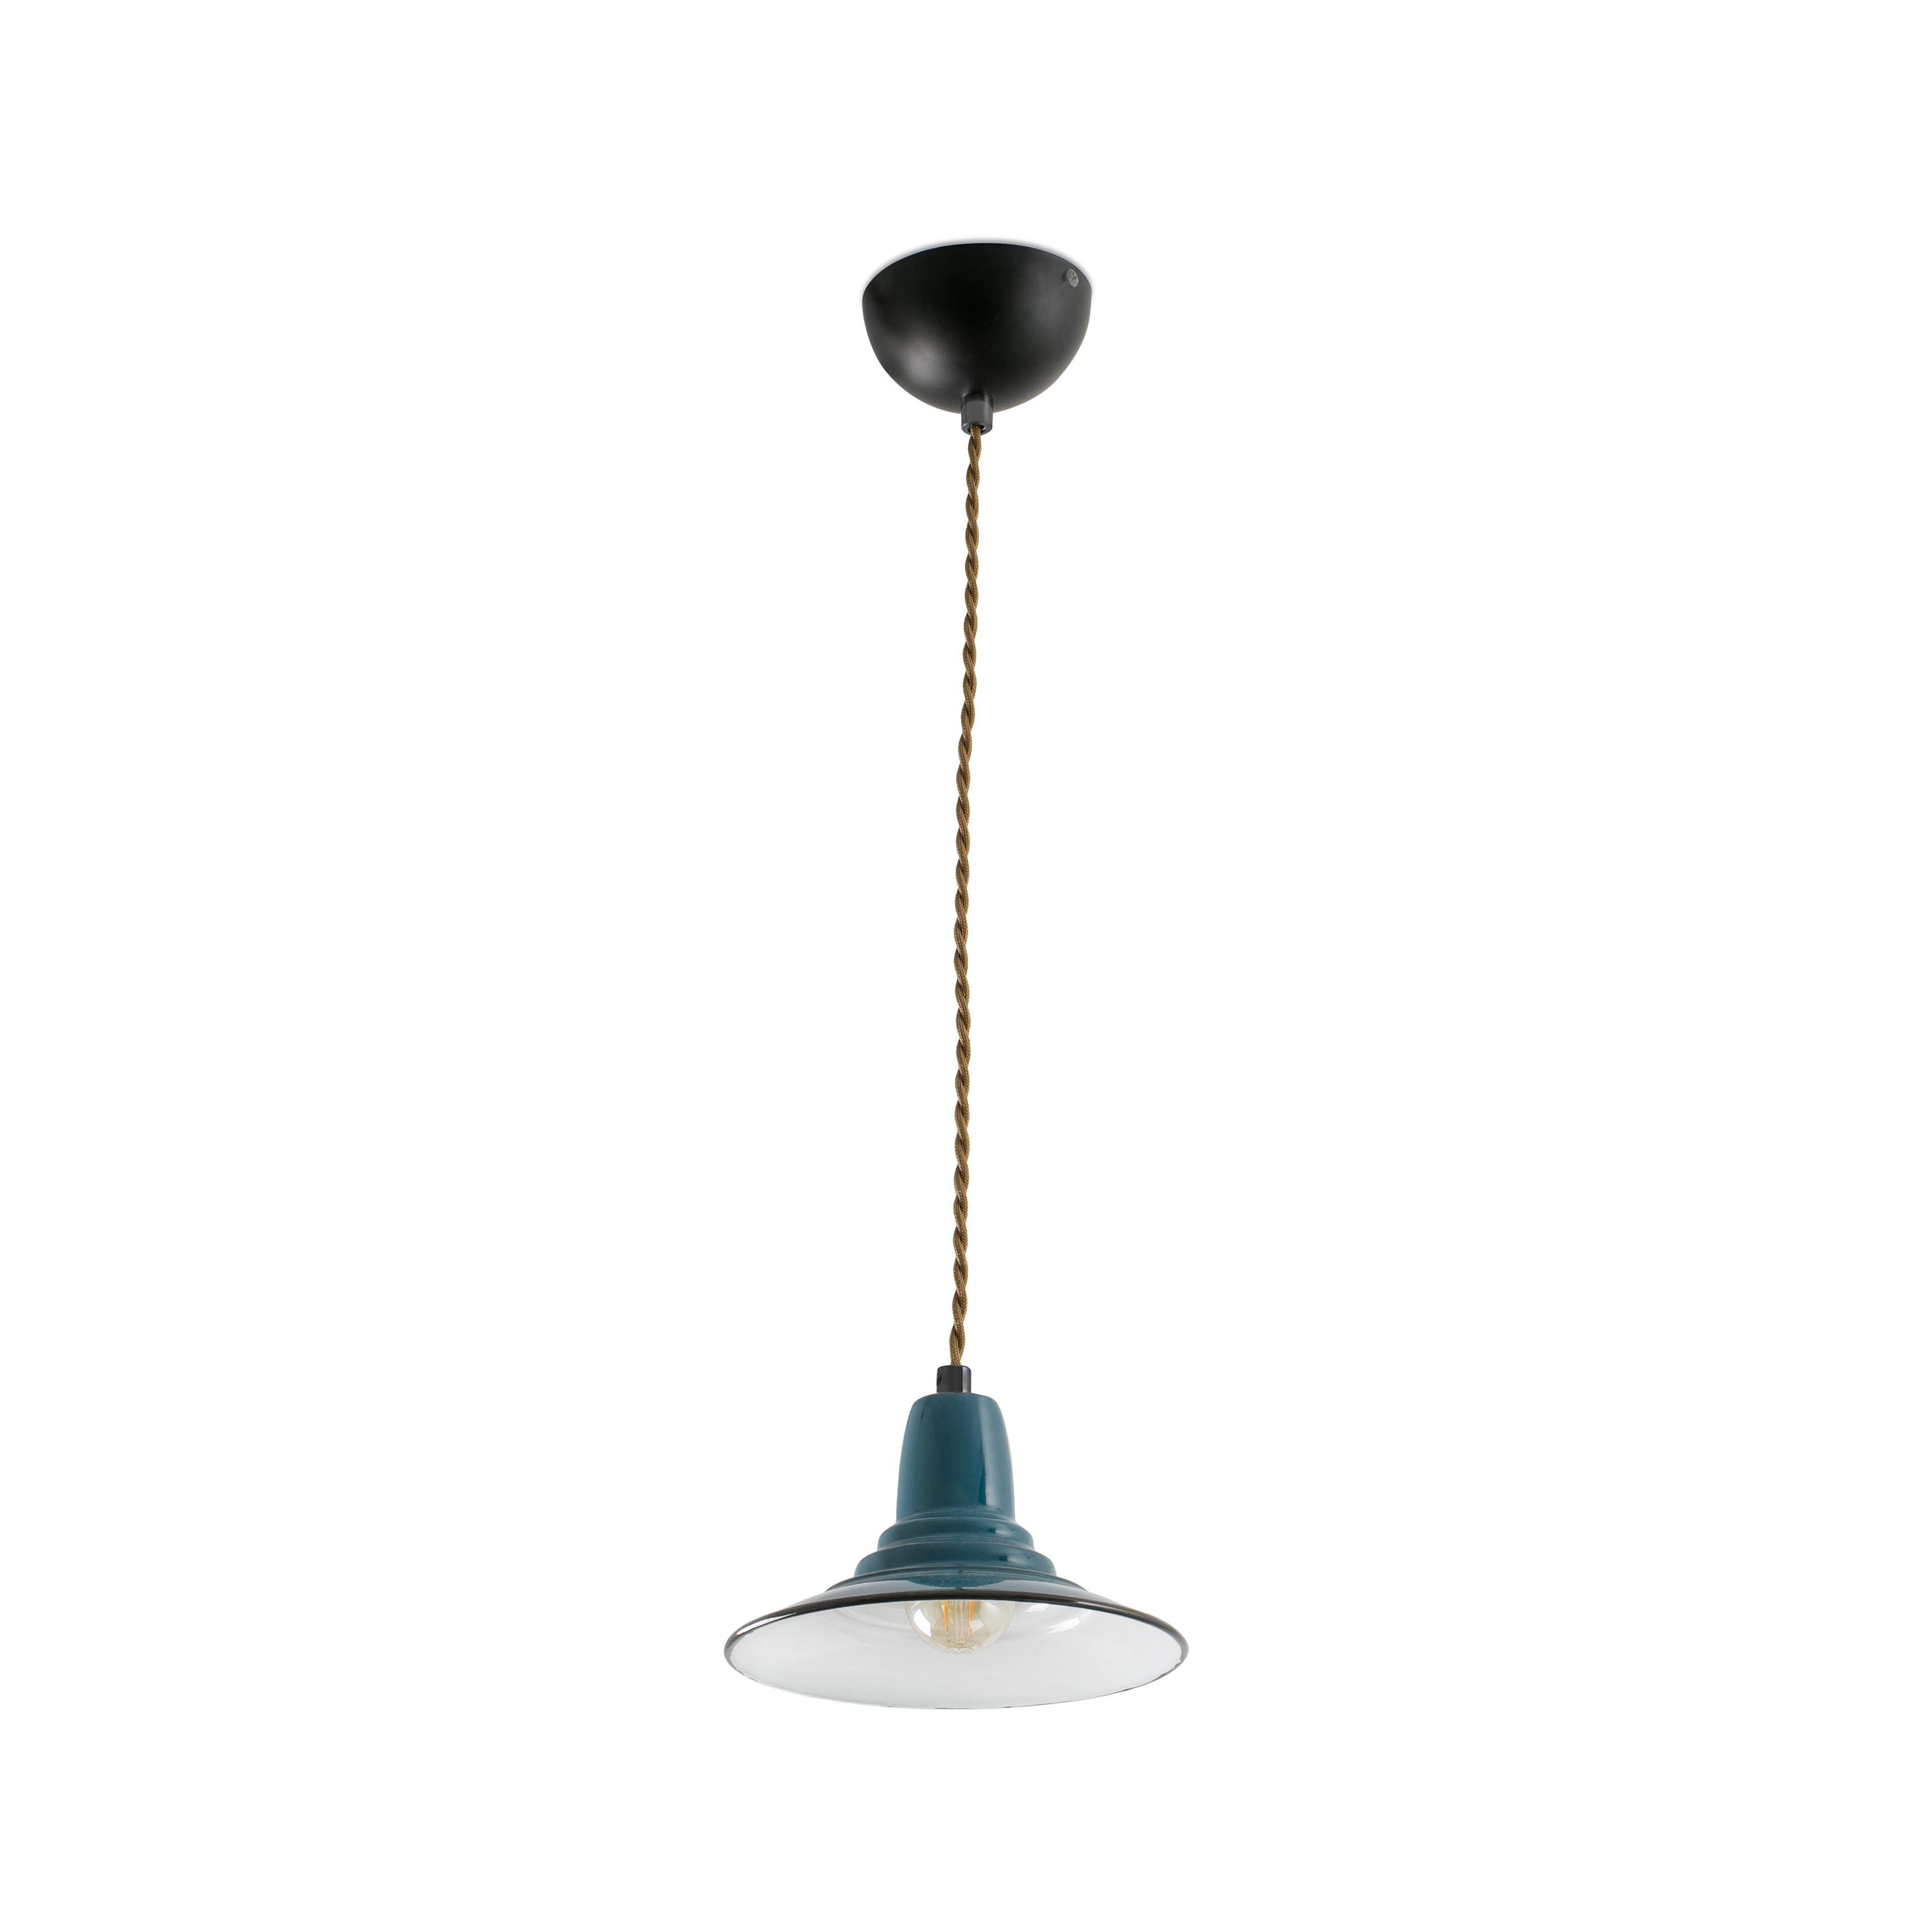 Ninette 1-Light Dome Pendants regarding Best and Newest 1 Light Ceiling Pendant White, Blue